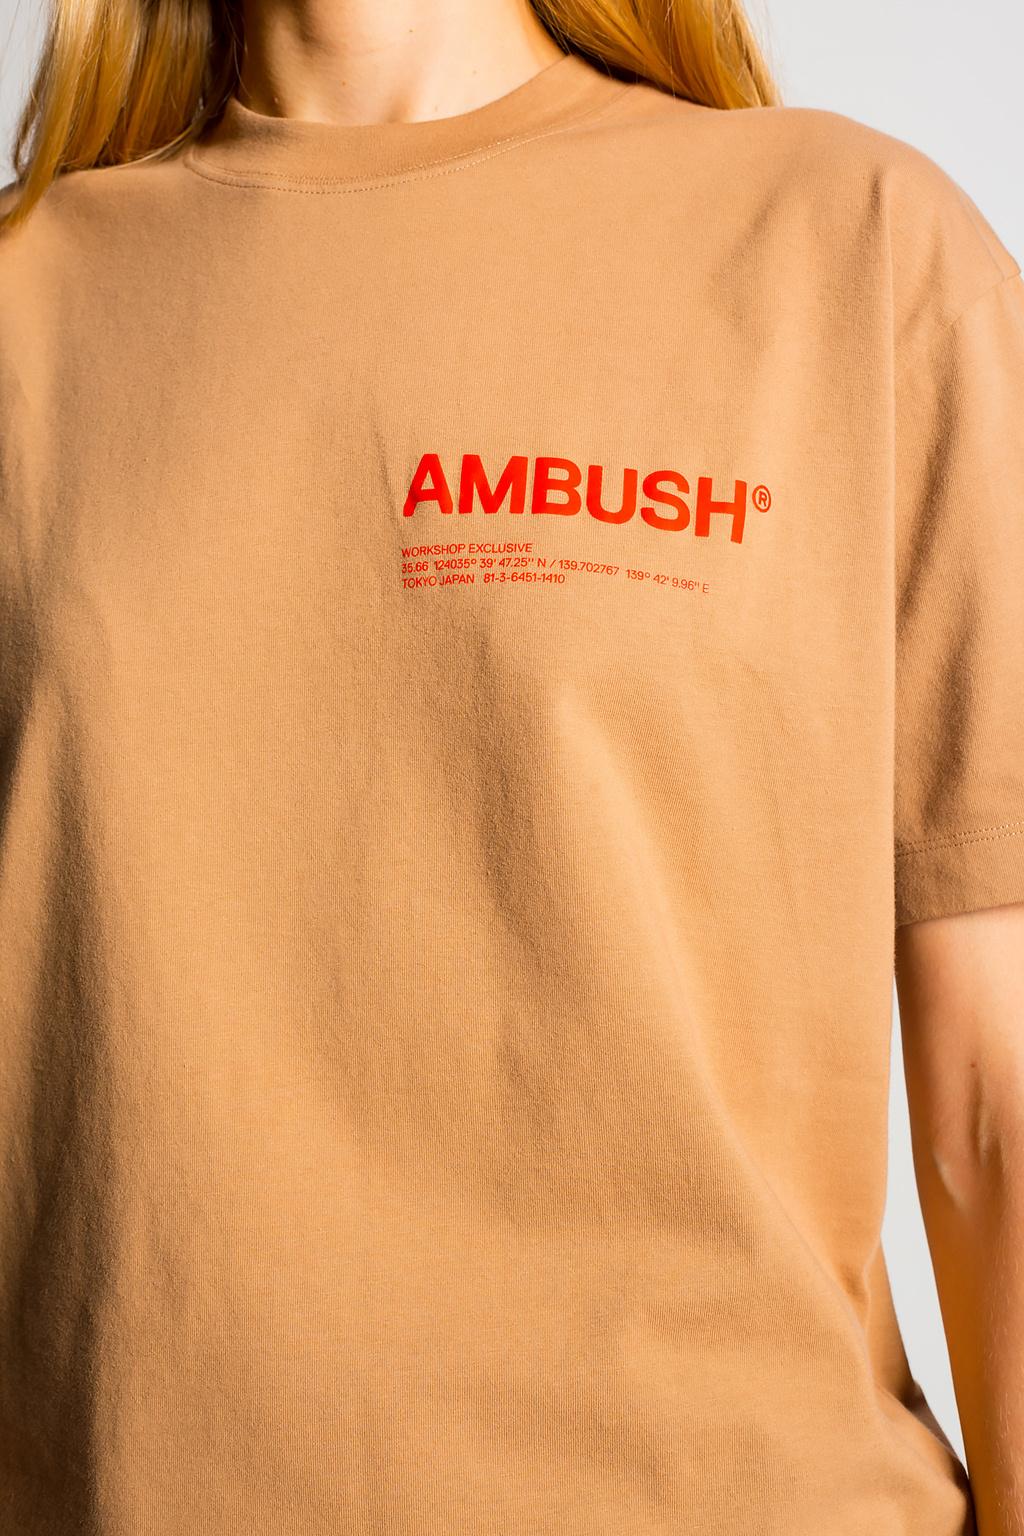 Ambush T-shirt with logo